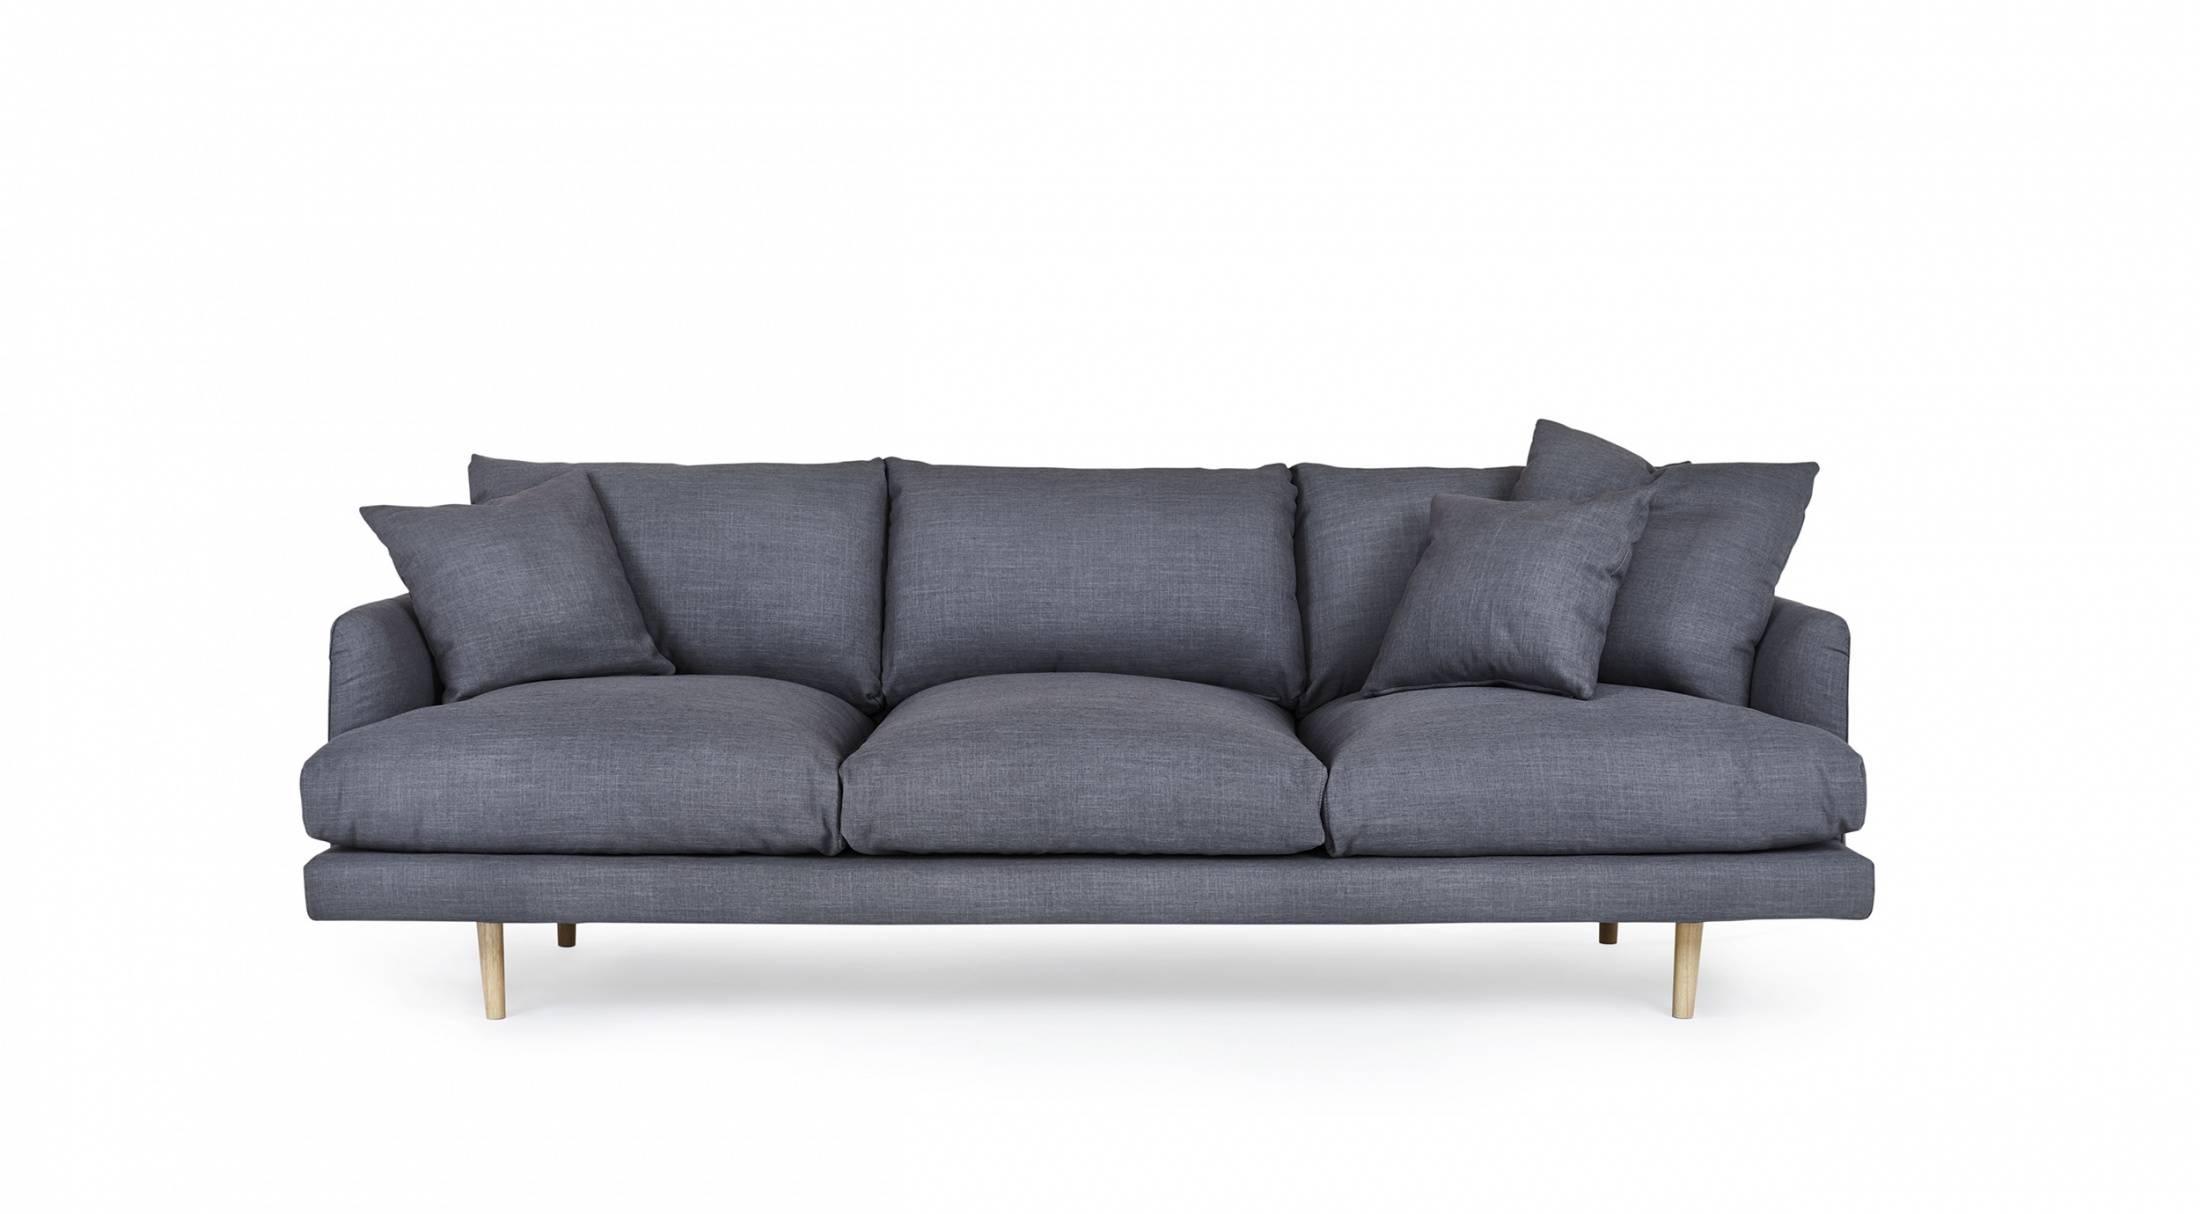 Hampton - 4 Seat Sofa | Loungelovers with regard to 4 Seat Sofas (Image 17 of 30)